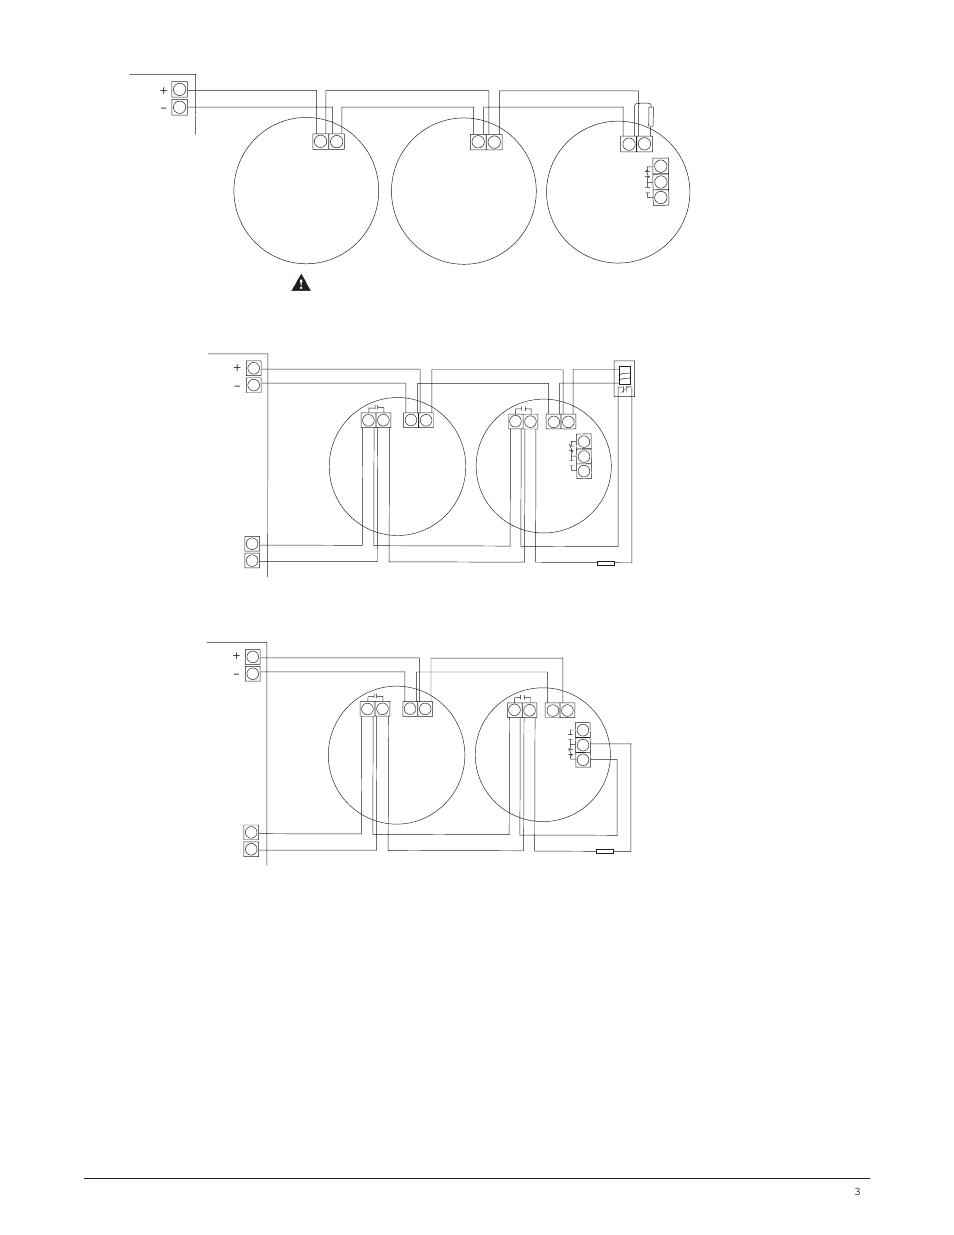 Edwards Smoke Detector Wiring Diagram Library Brian James Trailer Testing The Removing Signaling Esl 500n Series User Manual